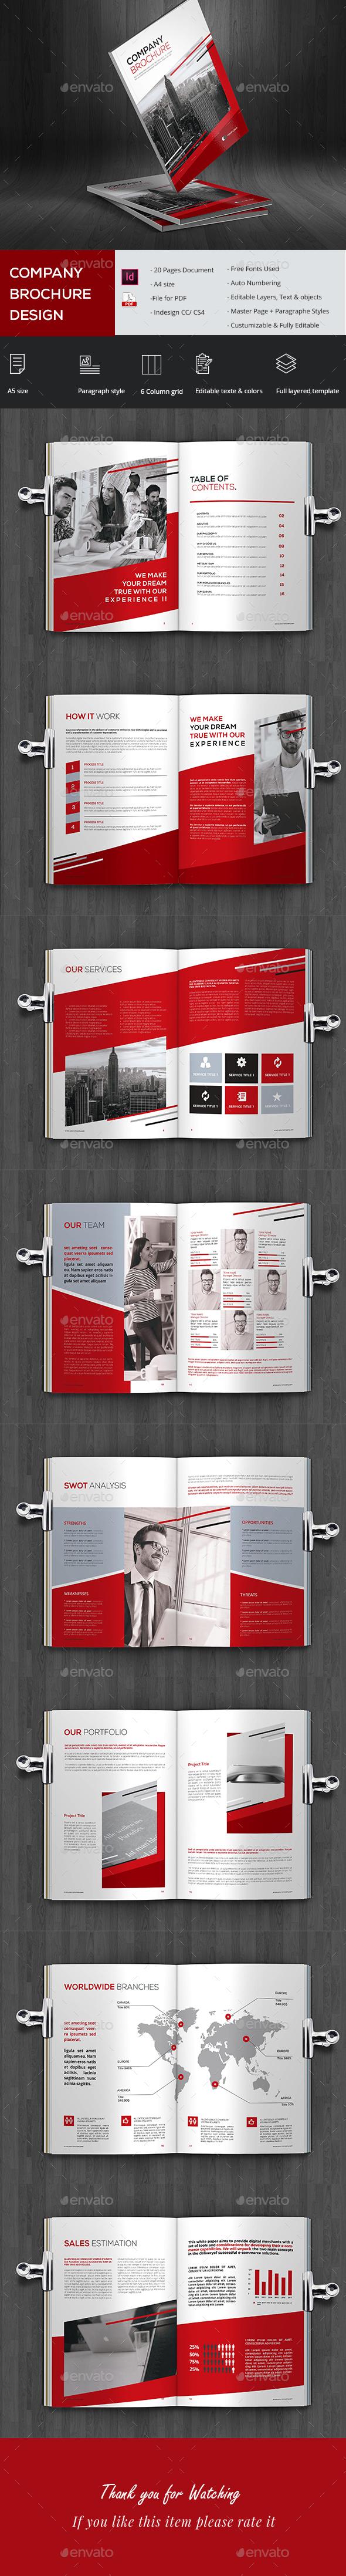 Stylish Company Brochure - Brochures Print Templates